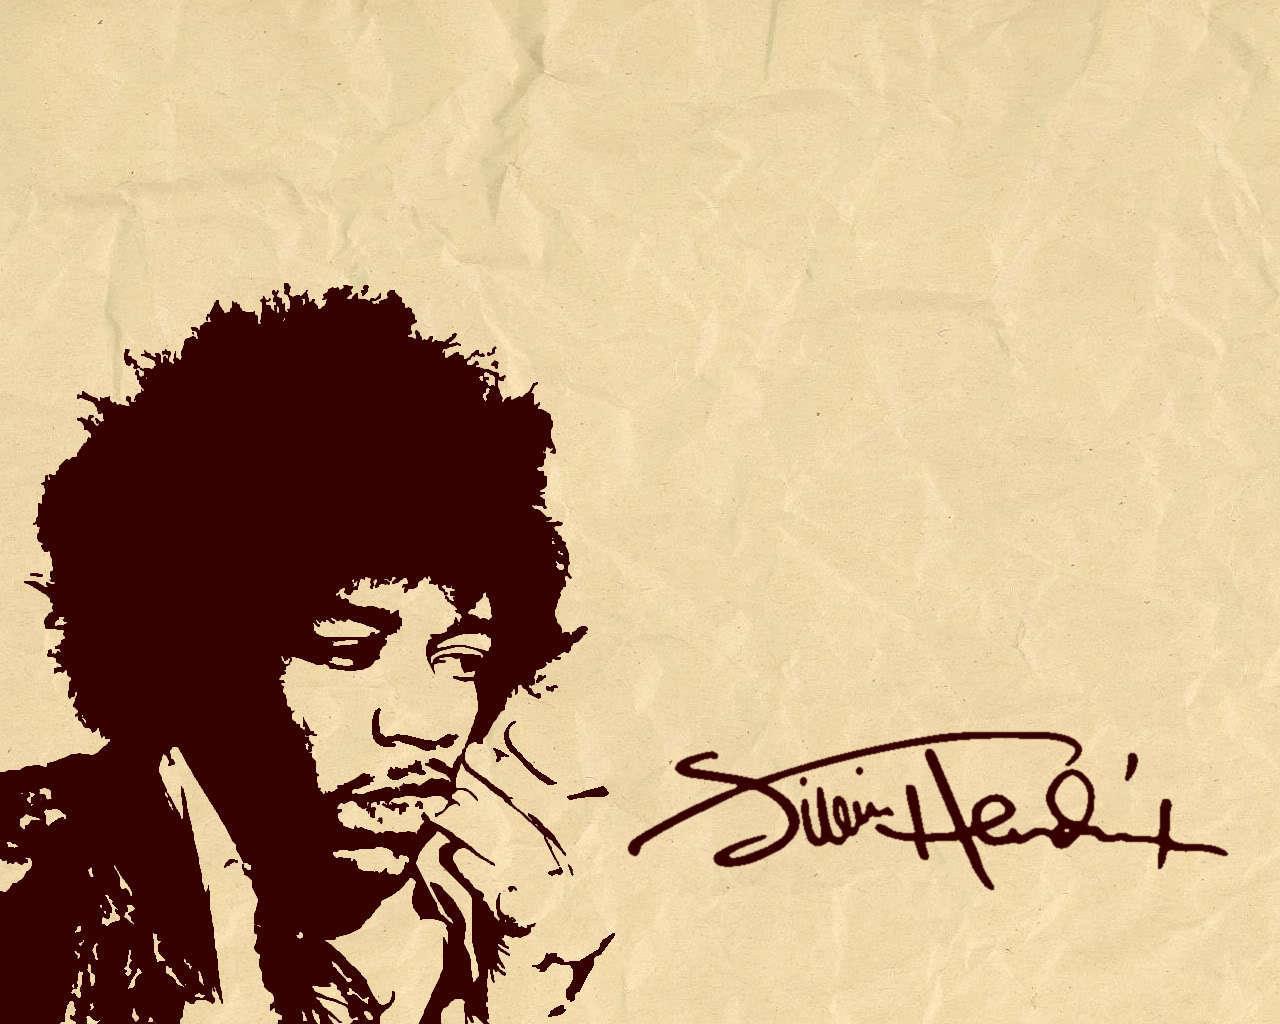 jimi hendrix classic rock wallpaper 17511809 fanpop